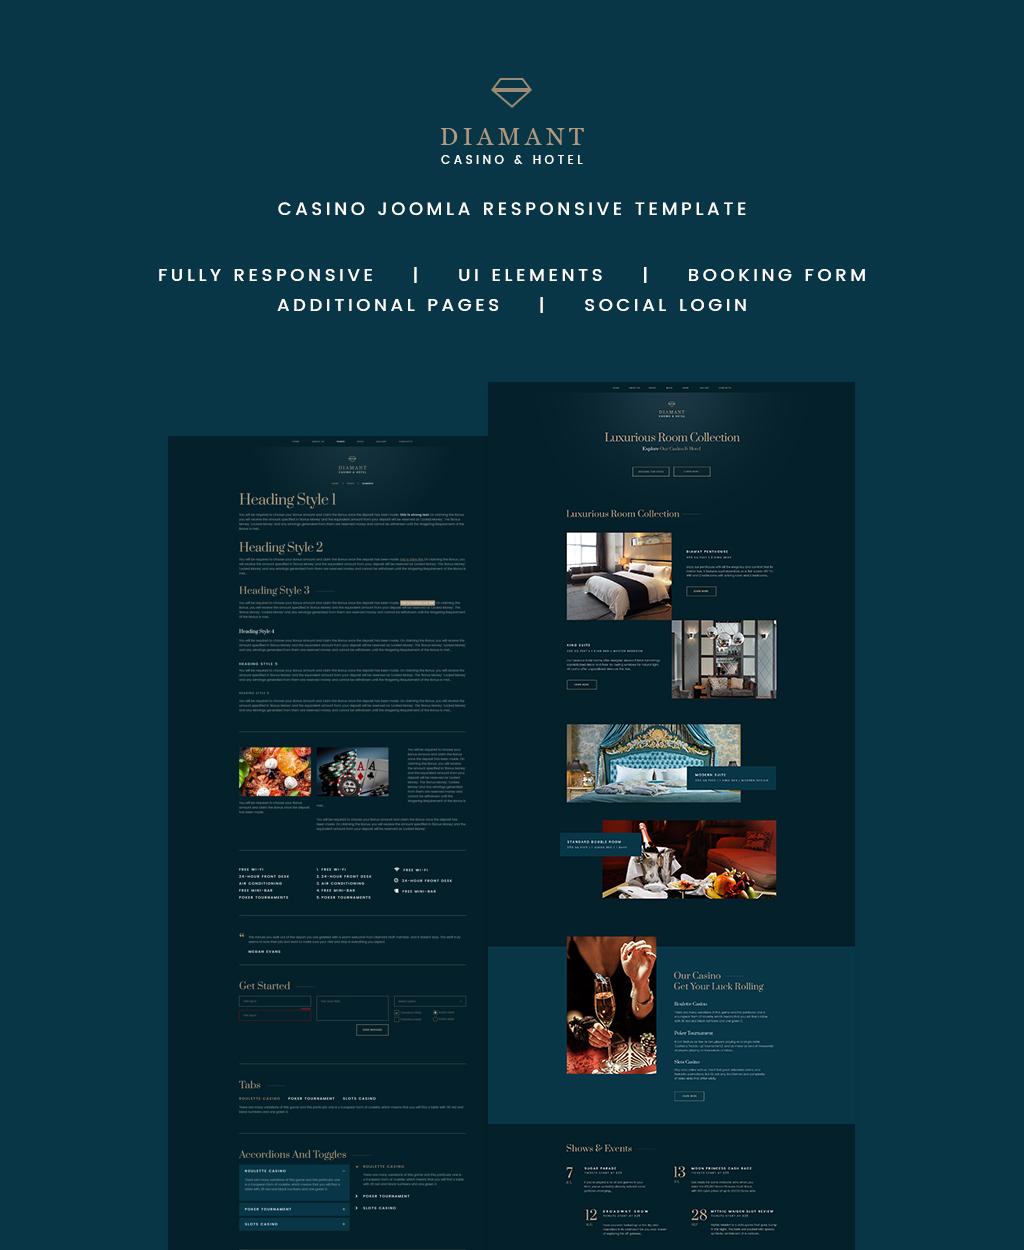 Diamant - Casino & Hotel Template Joomla №64731 - screenshot